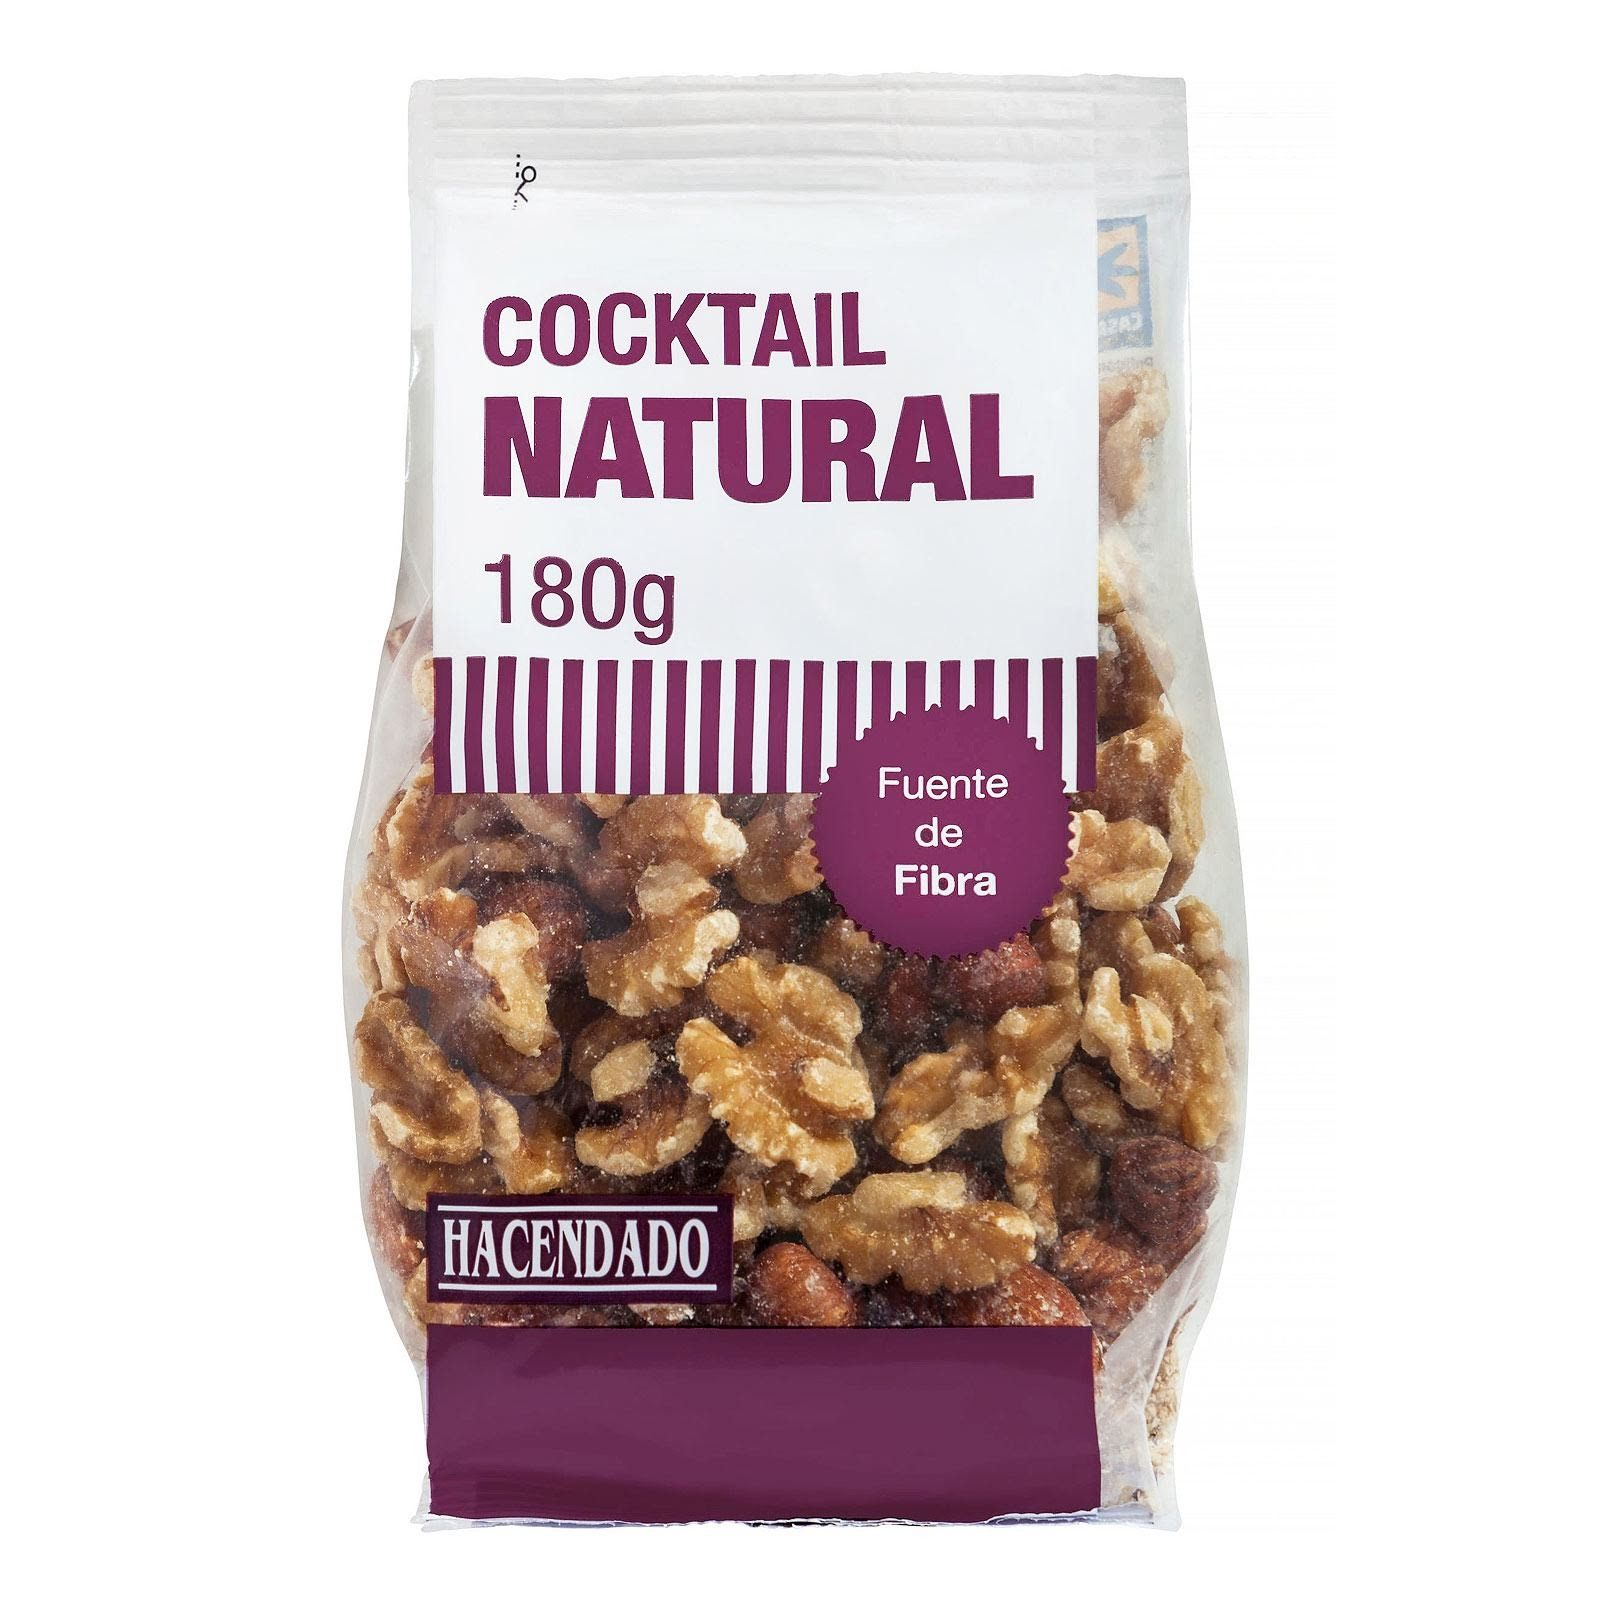 cocktail-natural-hacendado-mercadona-1-8636587